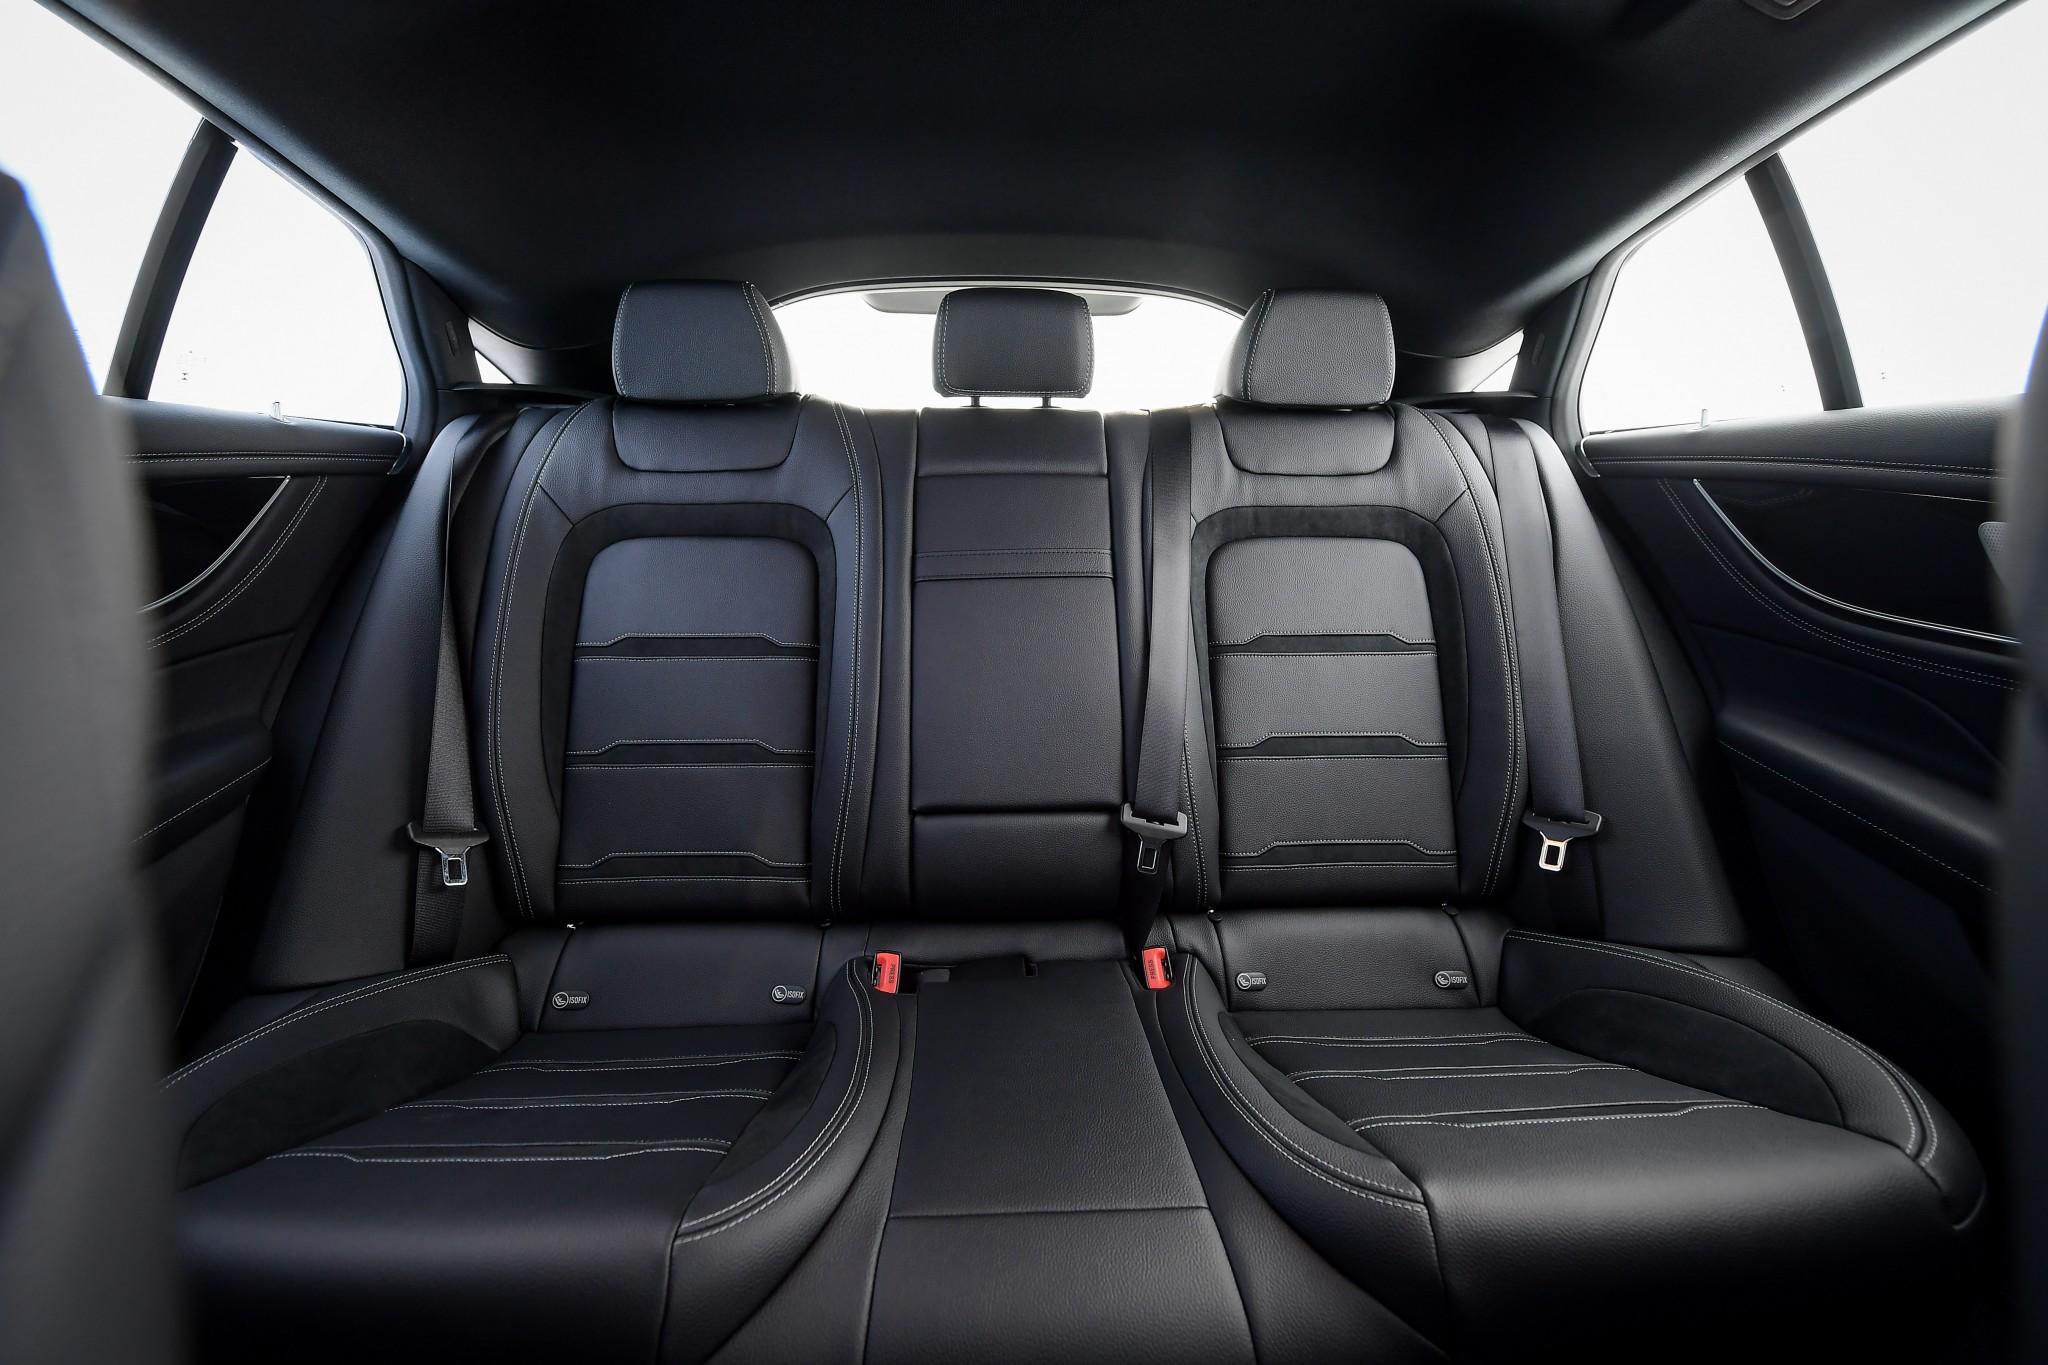 Mercedes-AMG GT 53 4MATIC+ 4-Door Coupe (Interior) (29)